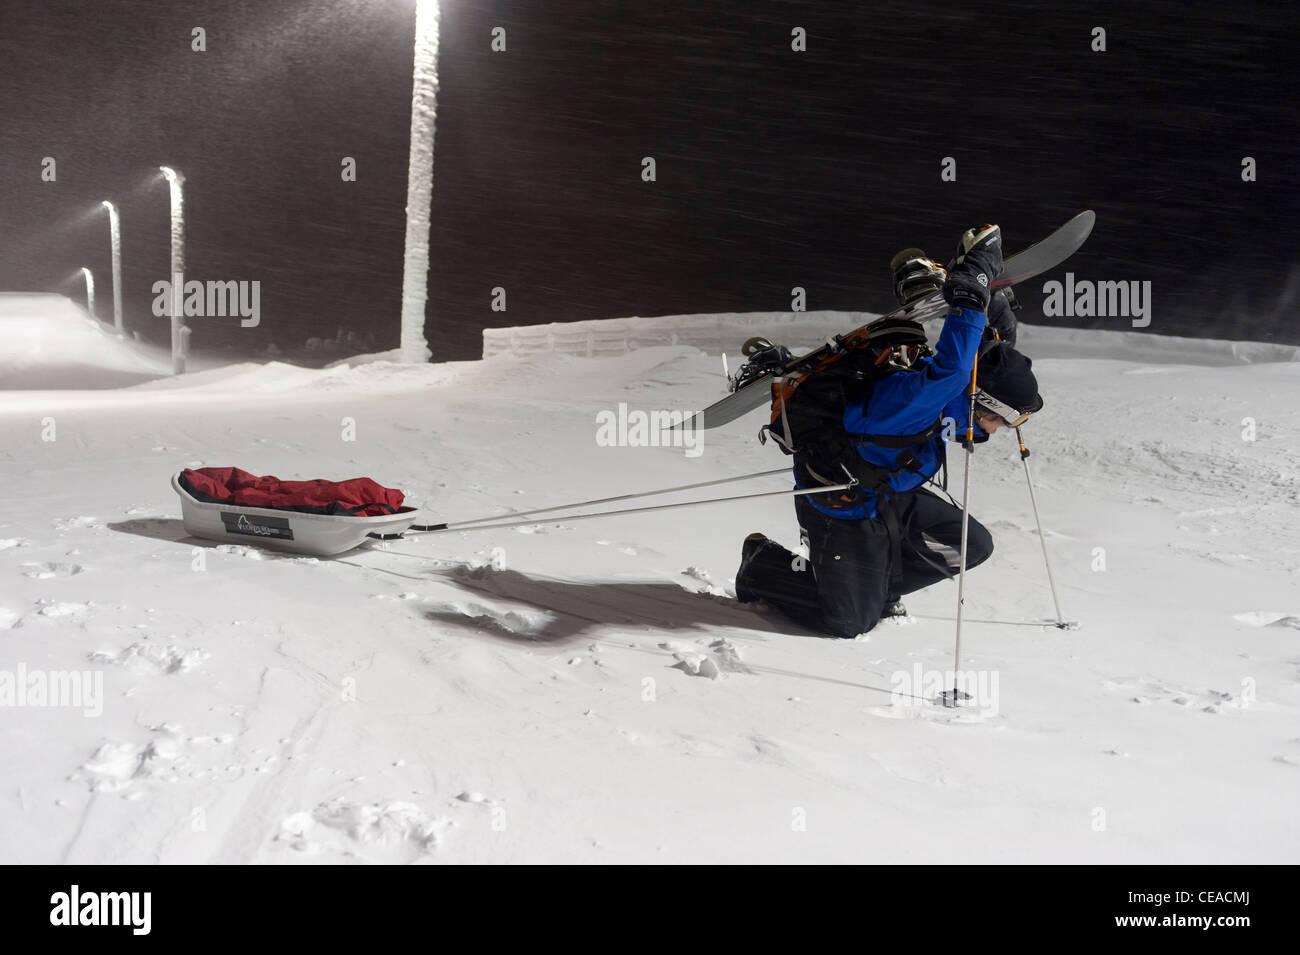 A nowboarder exercising sledge pulling up the slope of Pyhätunturi, Finnish Lapland. - Stock Image